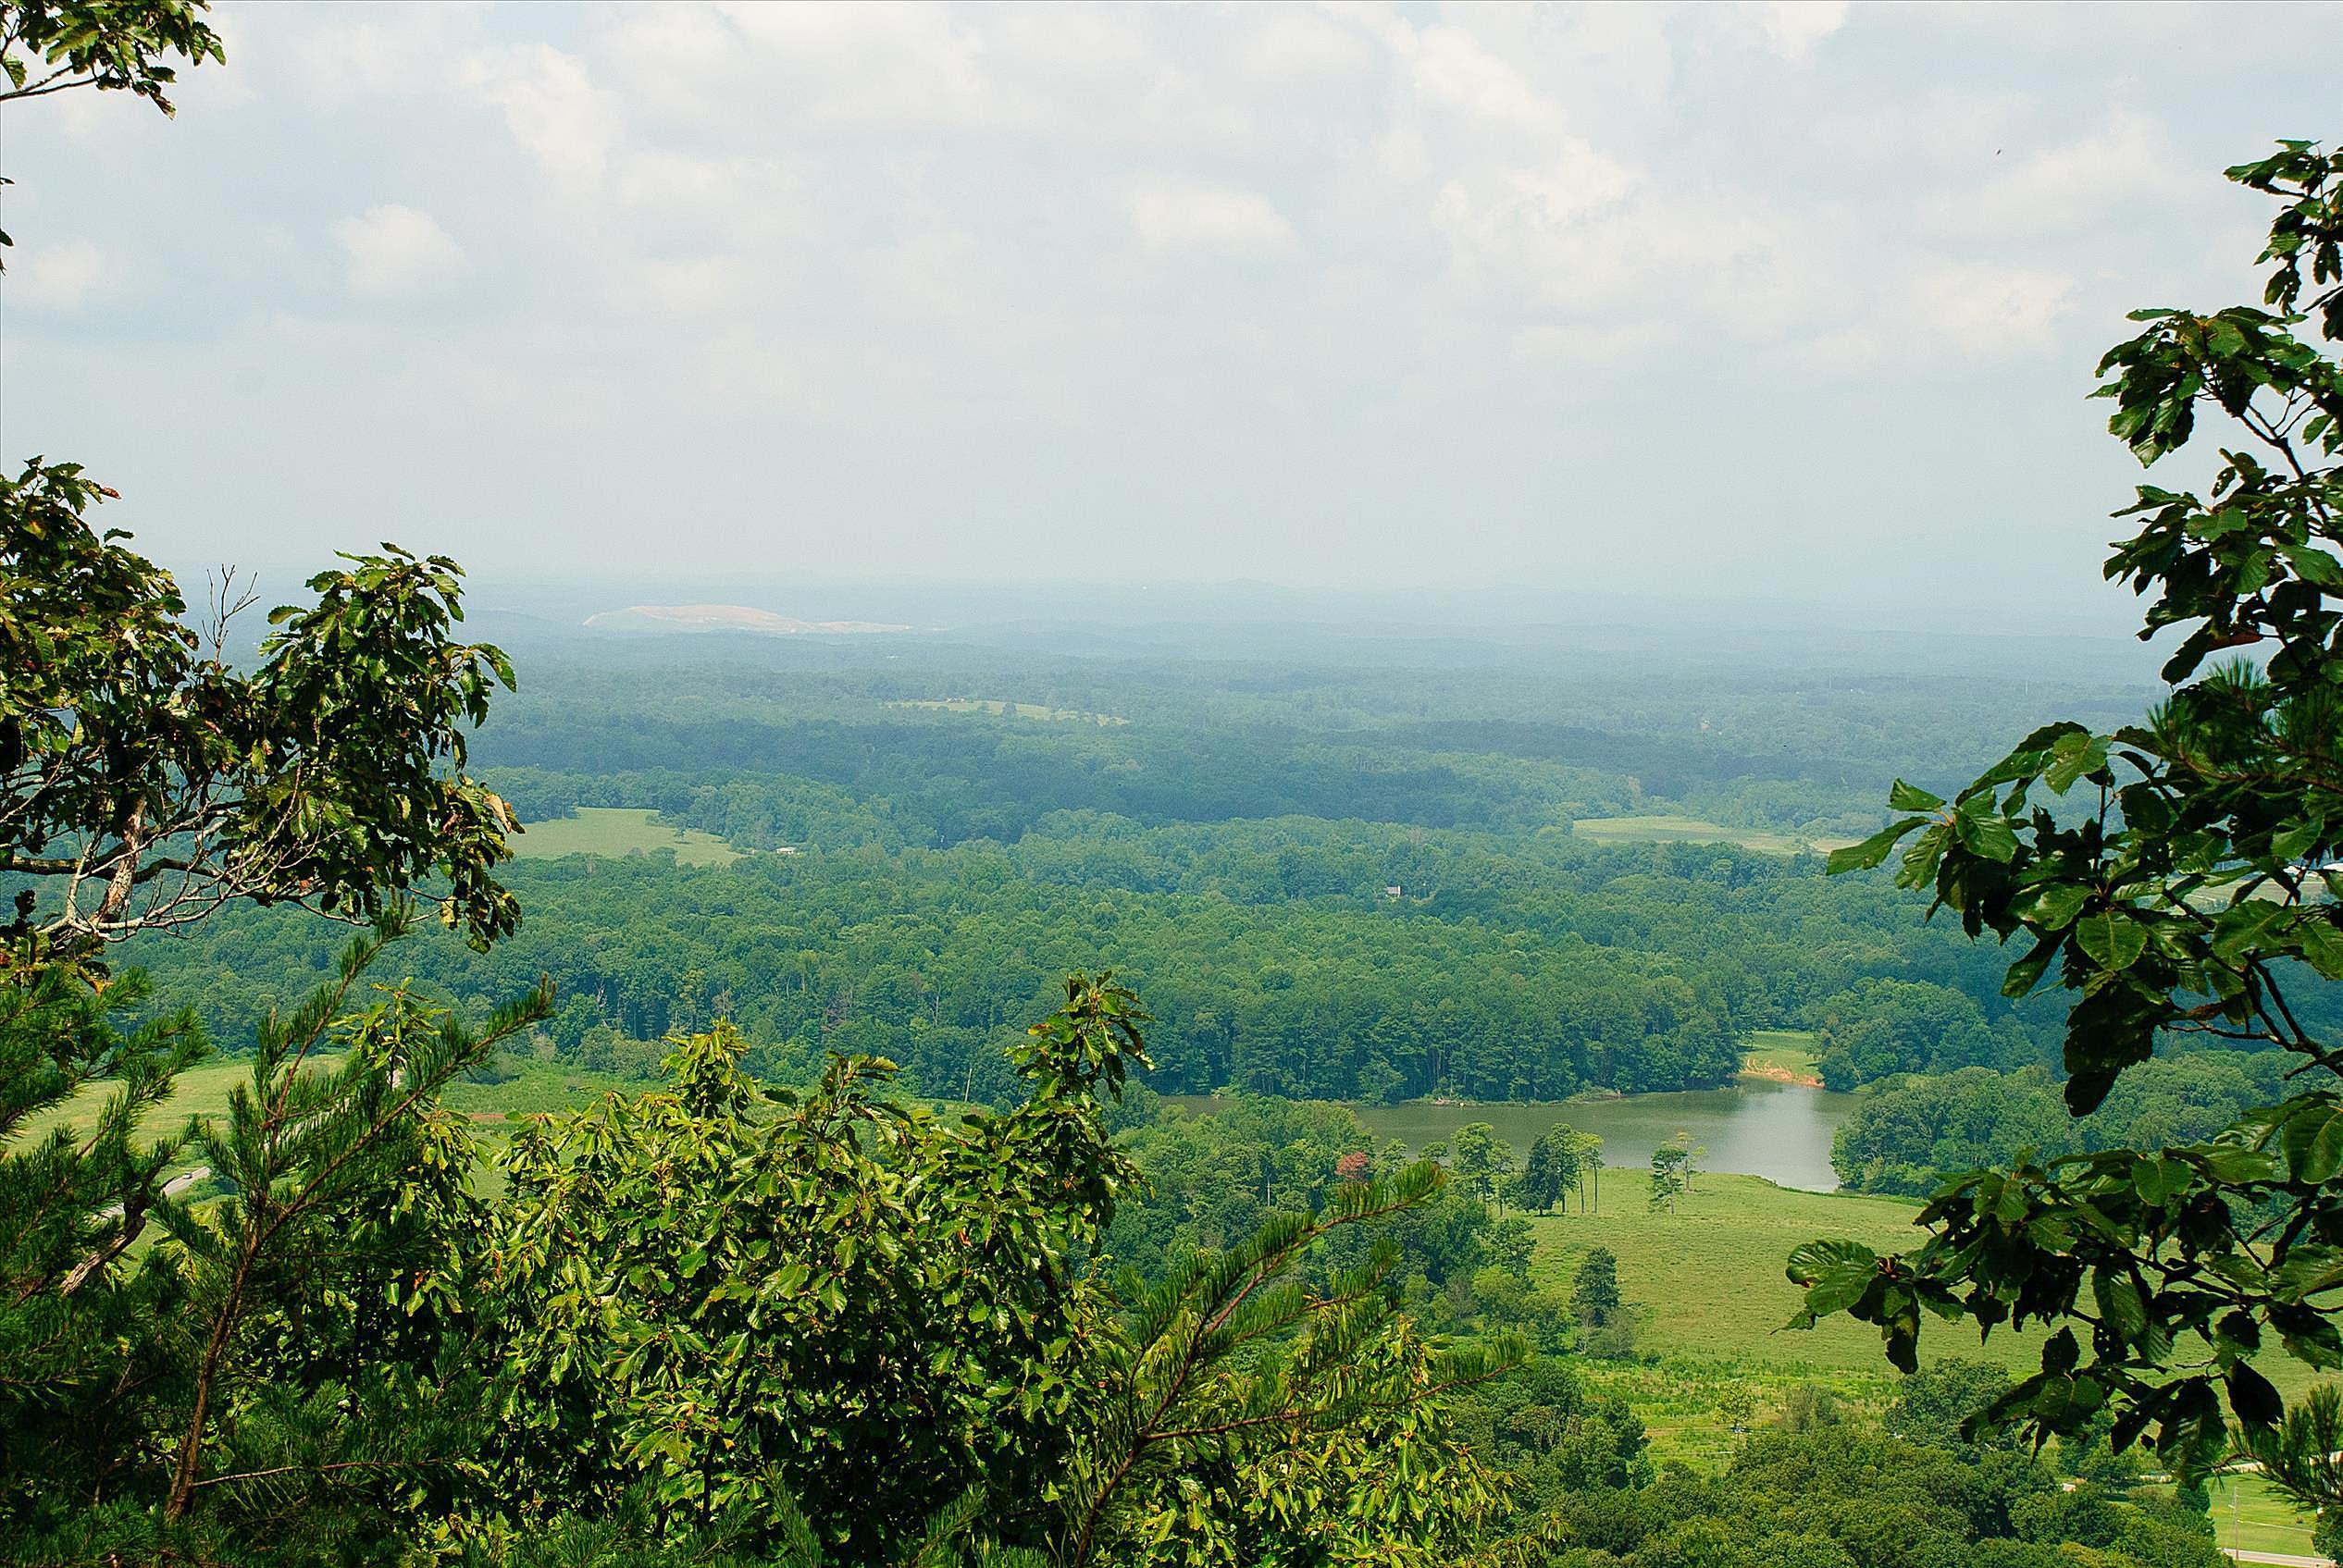 Indian Seats Trail at Sawnee Mountain Preserve